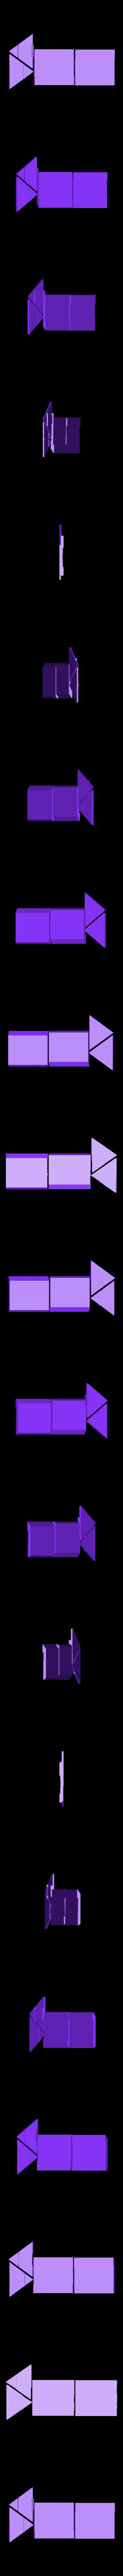 Burh_A_frame_flat.stl Download free STL file Saxon Burh A frame hut • 3D print object, Earsling